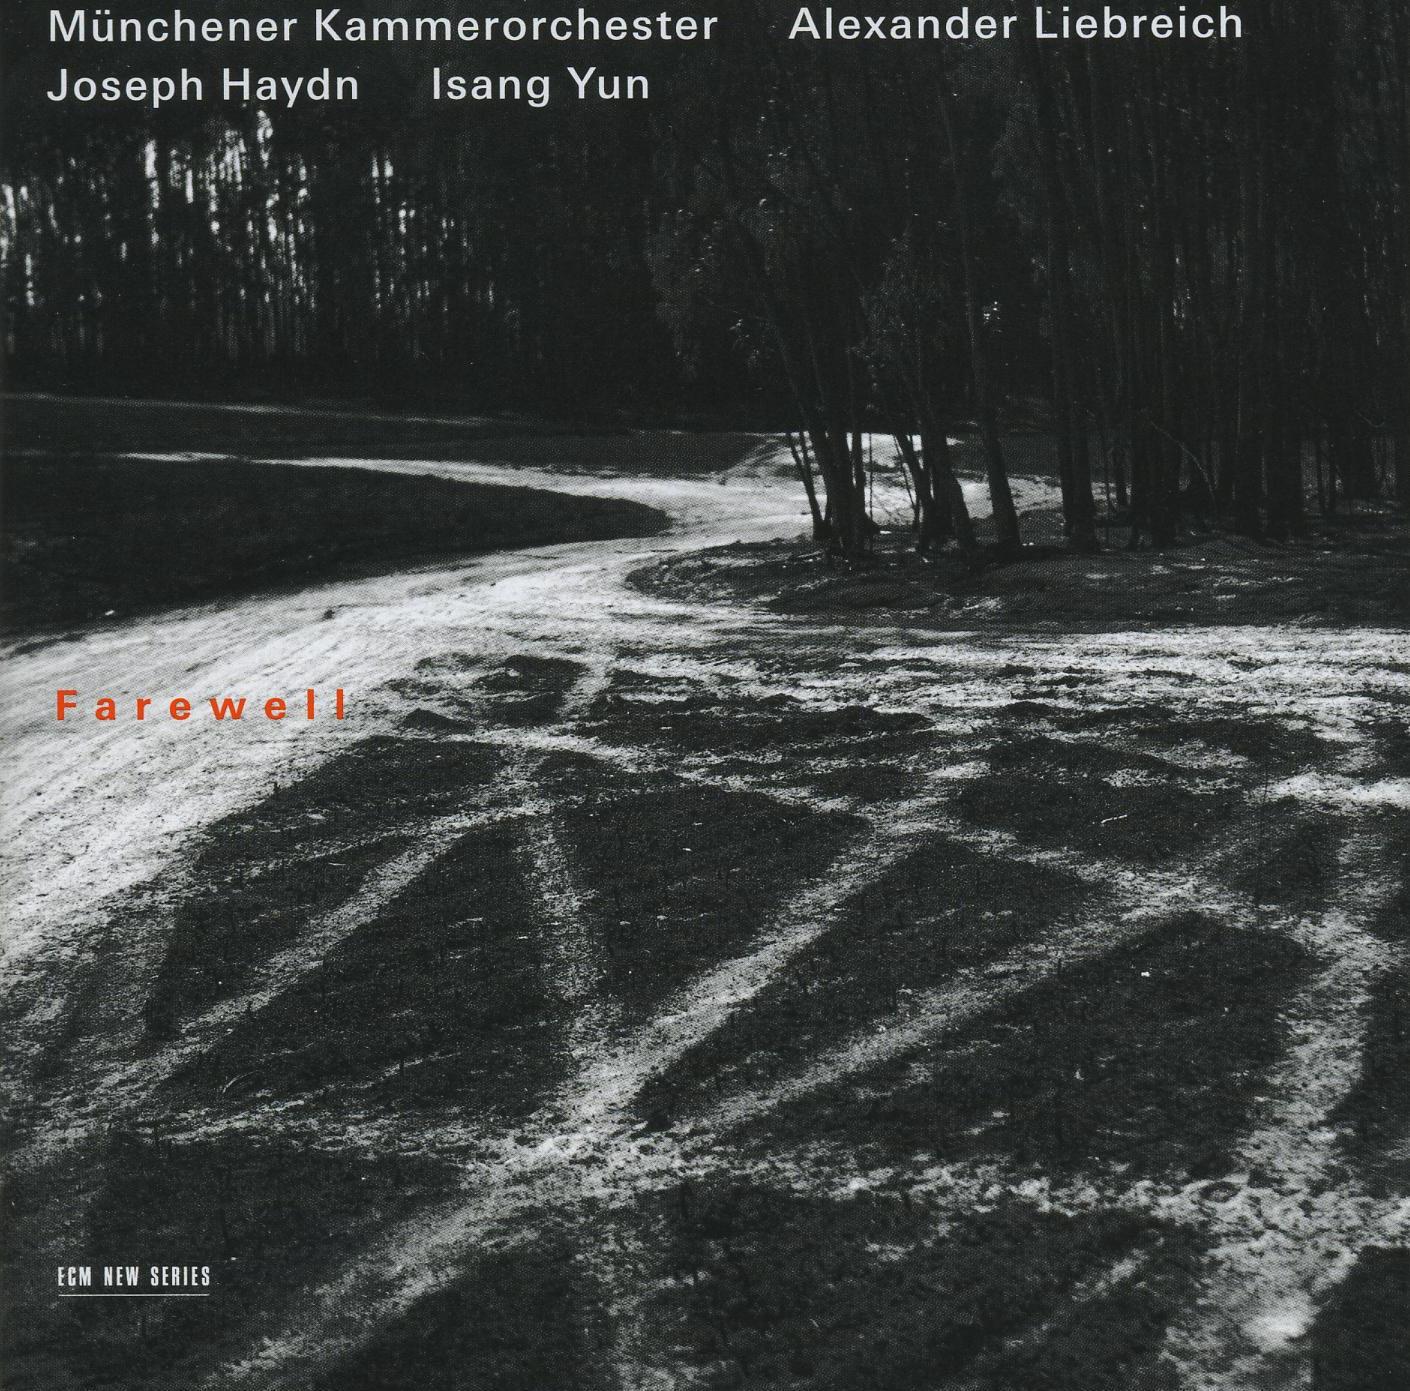 ECM Münchener Kammerorchester Farewell - Joseph Haydn / Isang Yun